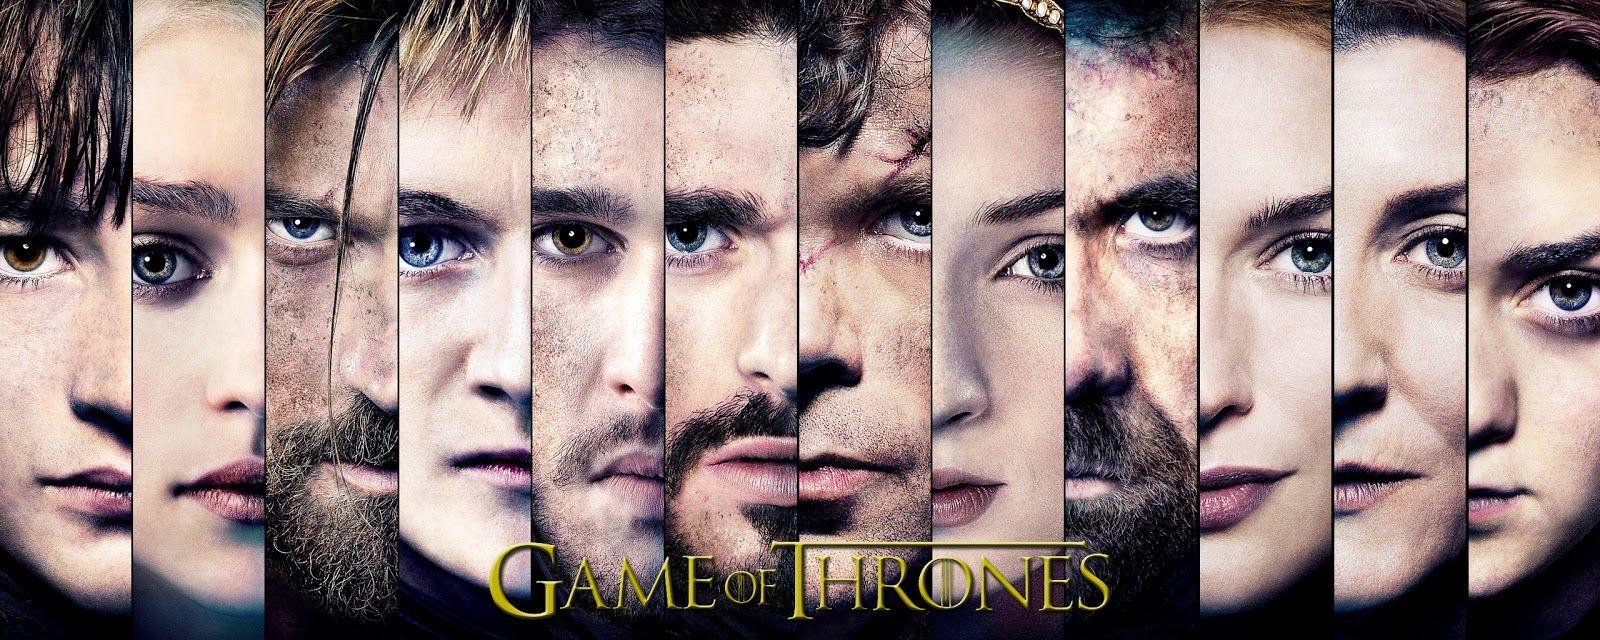 game of thrones tv series vs book